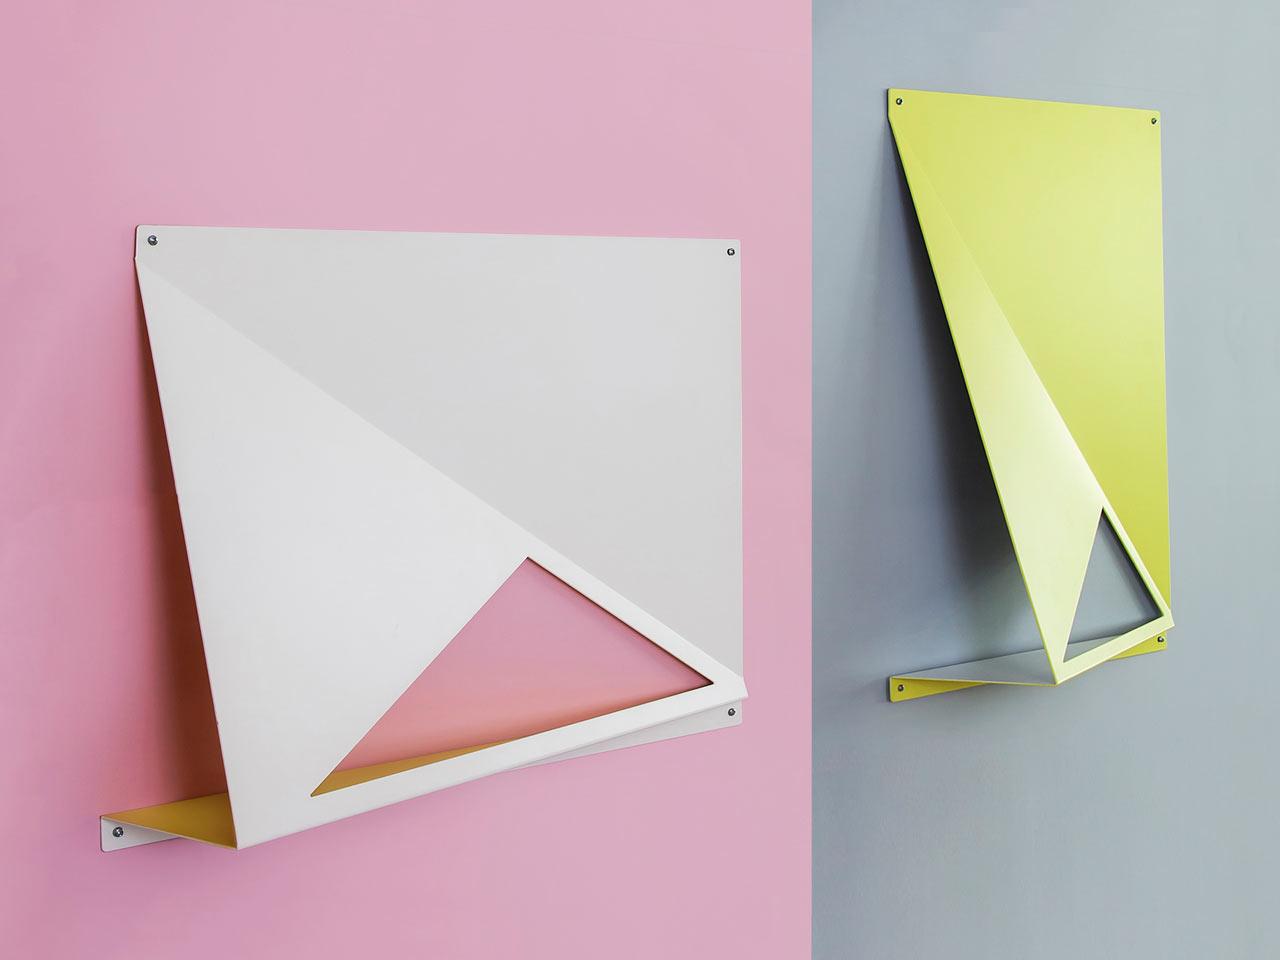 Mounted Shelves that Explore Geometry